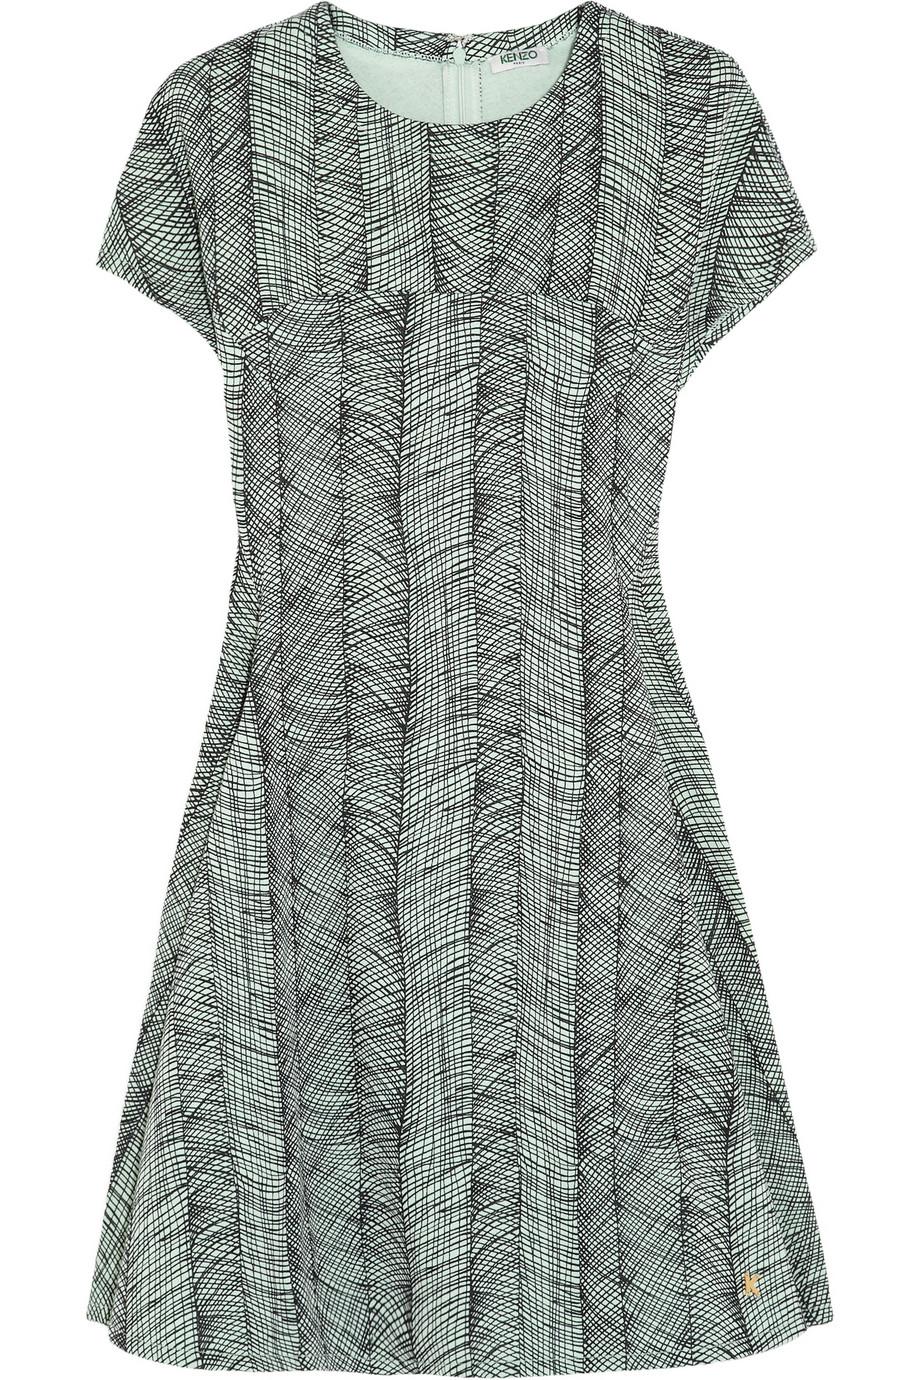 Lyst Kenzo Printed Cotton Jersey Mini Dress In Green